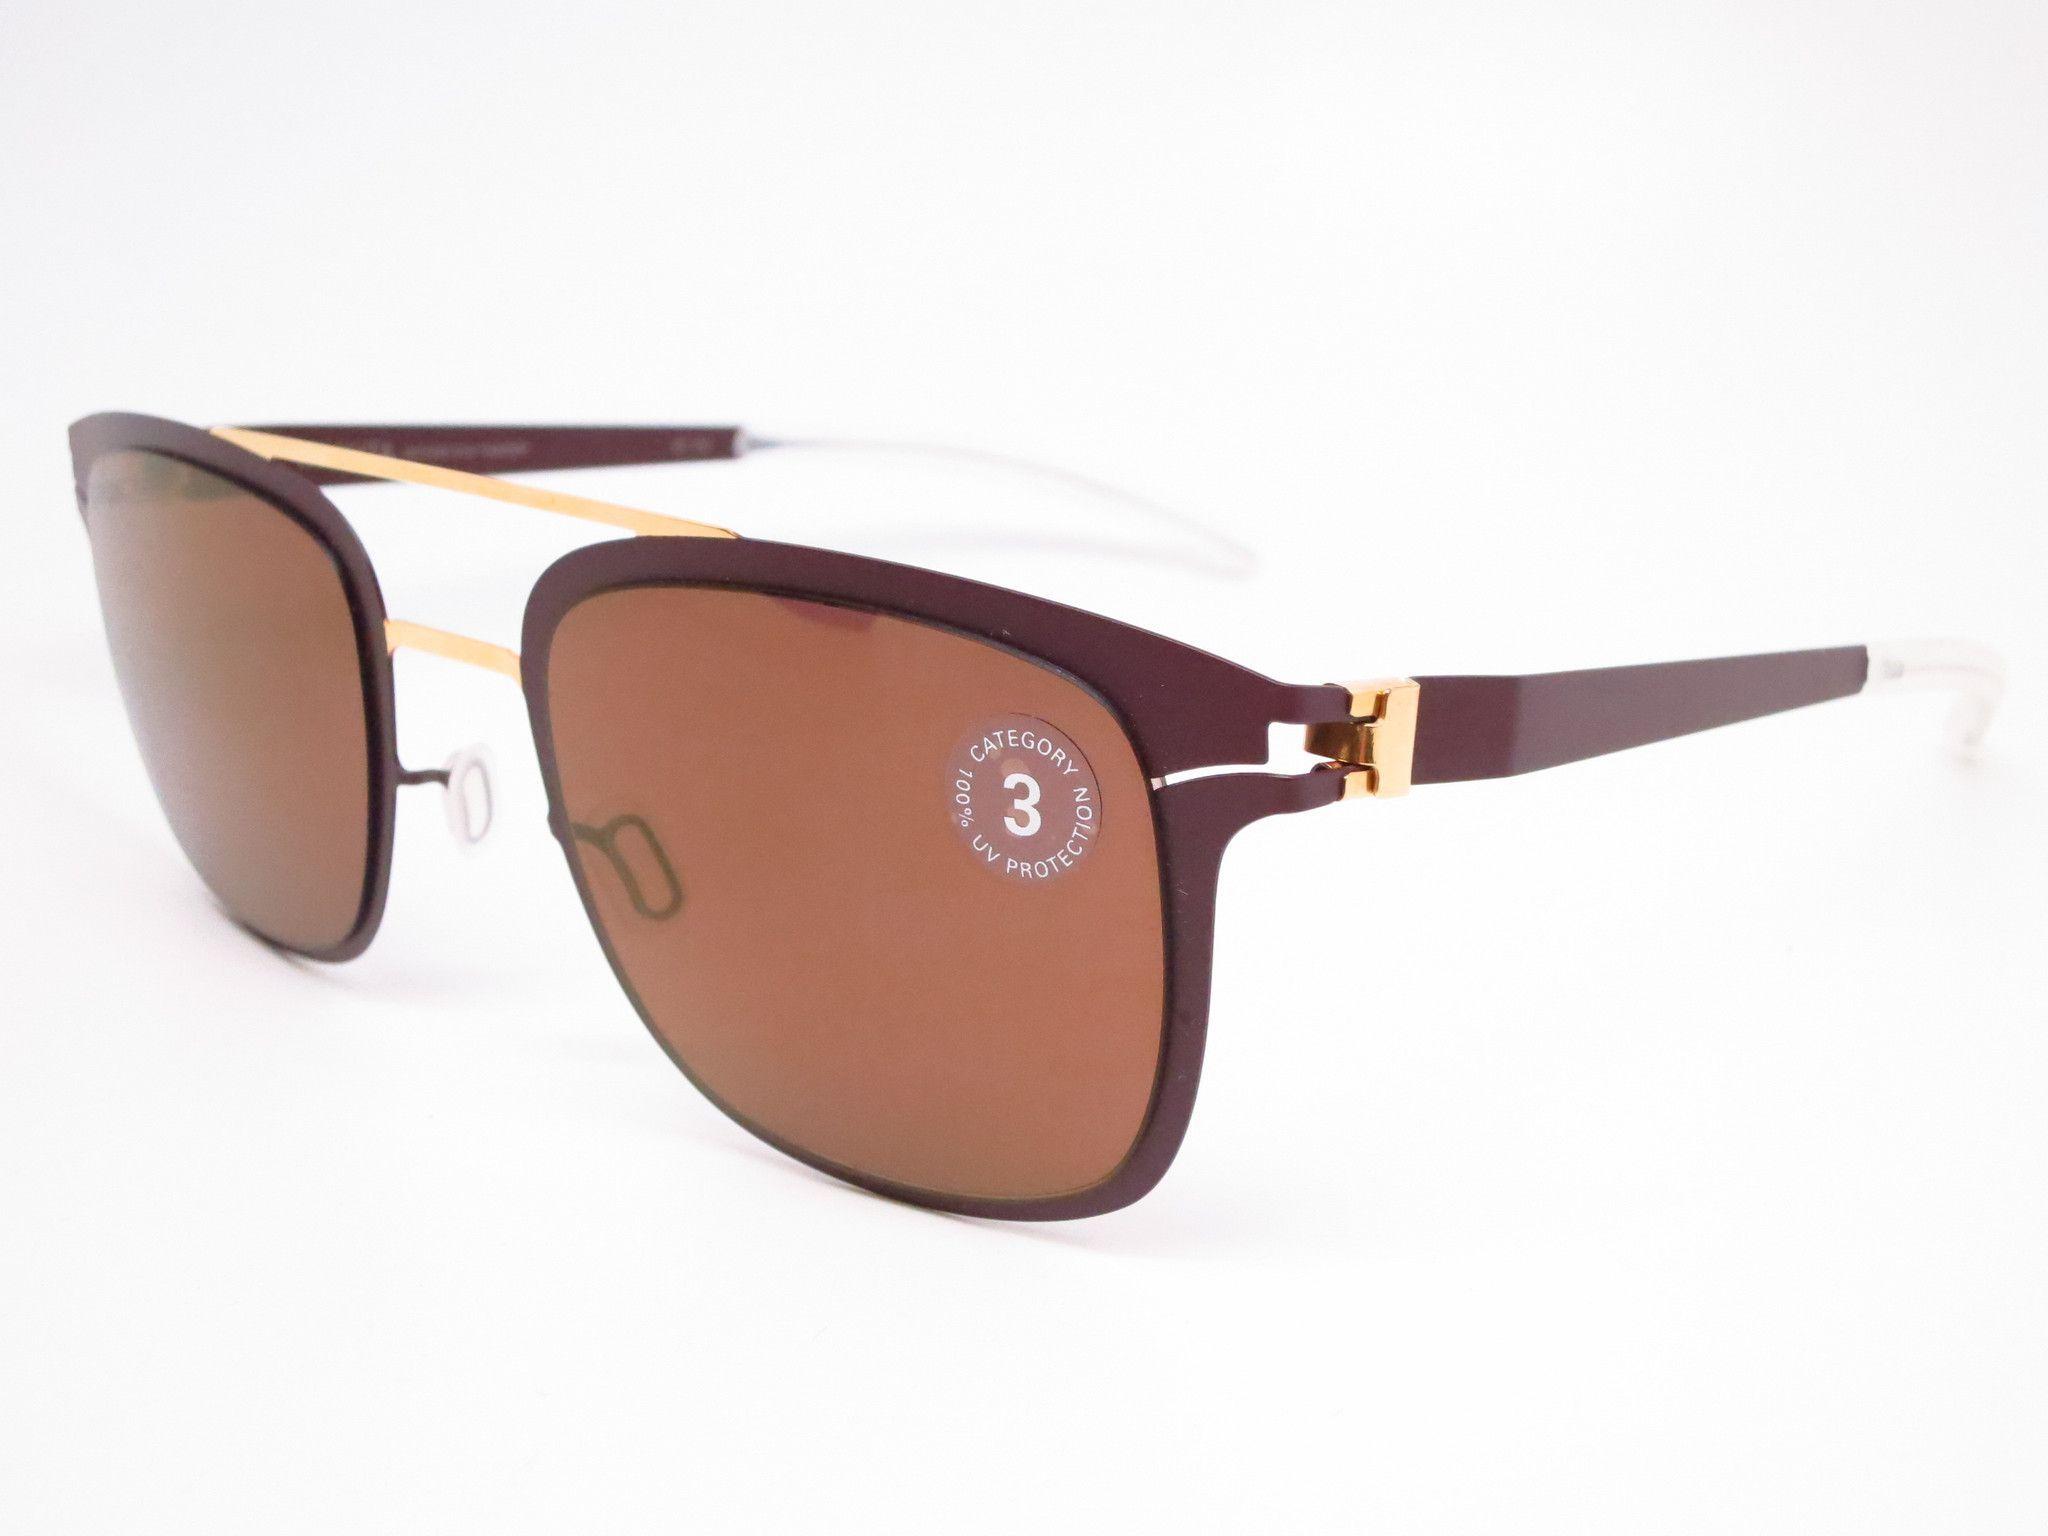 7896dcc3701 Mykita Hunter 164 Gold Terra Decades Sun Sunglasses